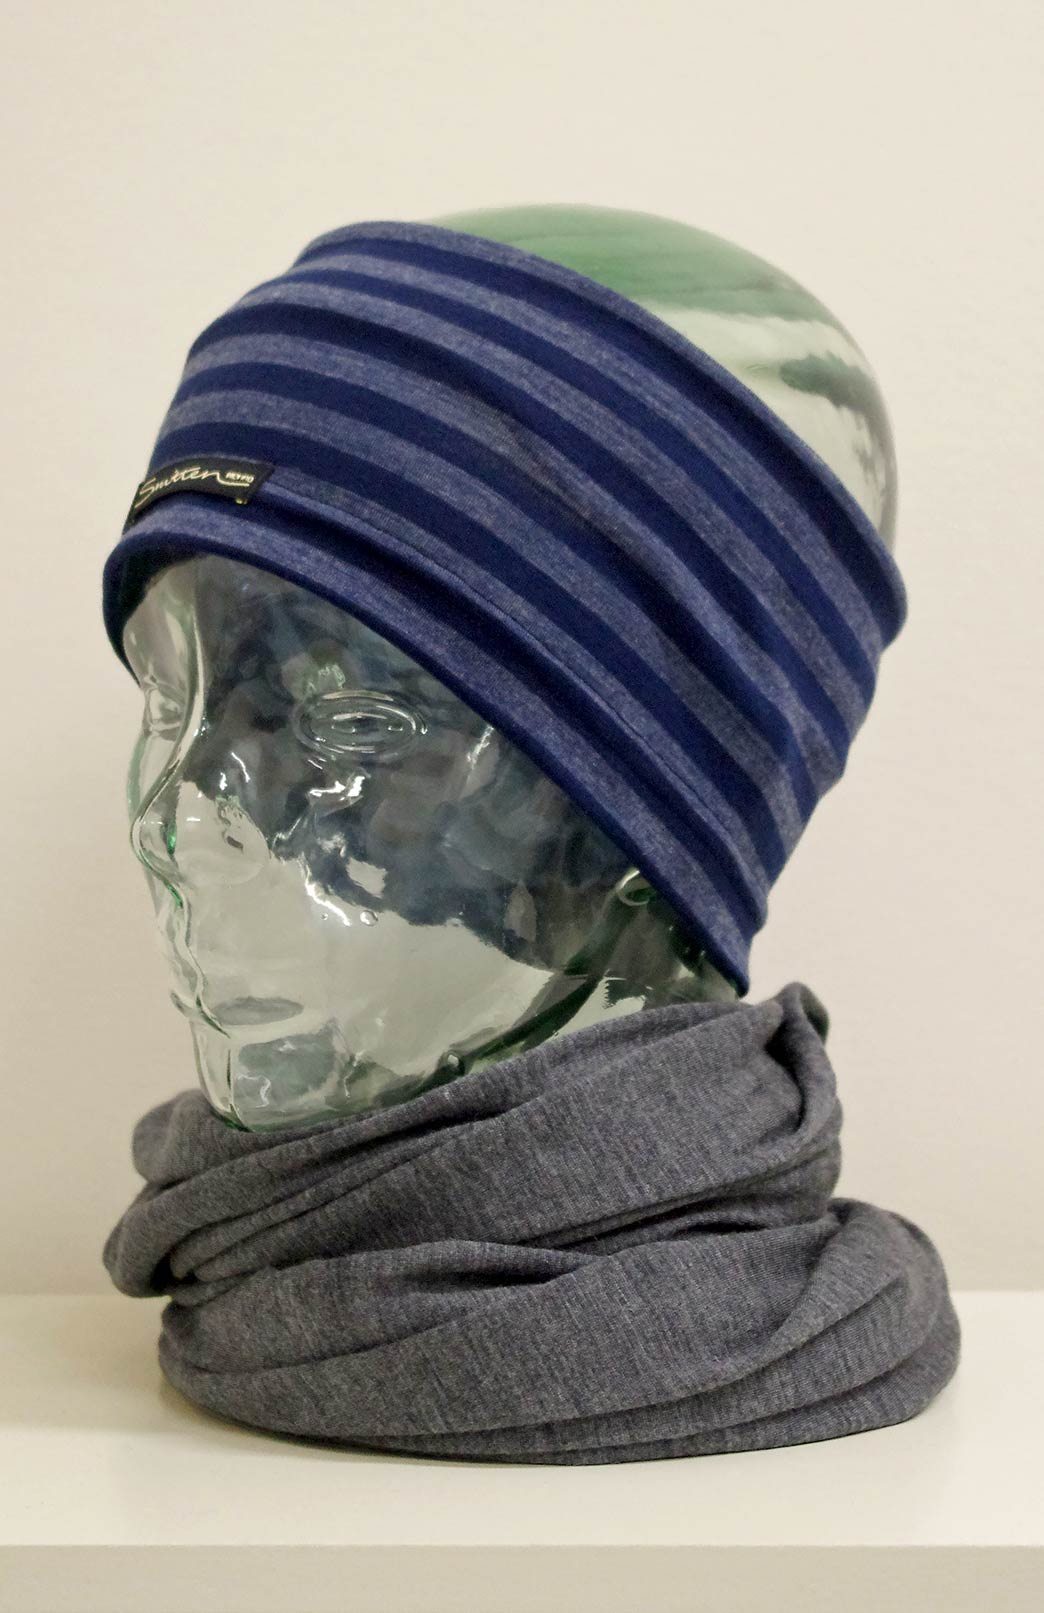 Headband / Ear Warmer - Unisex Indigo and Grey Stripe Merino Wool Headband and Ear Warmer - Smitten Merino Tasmania Australia